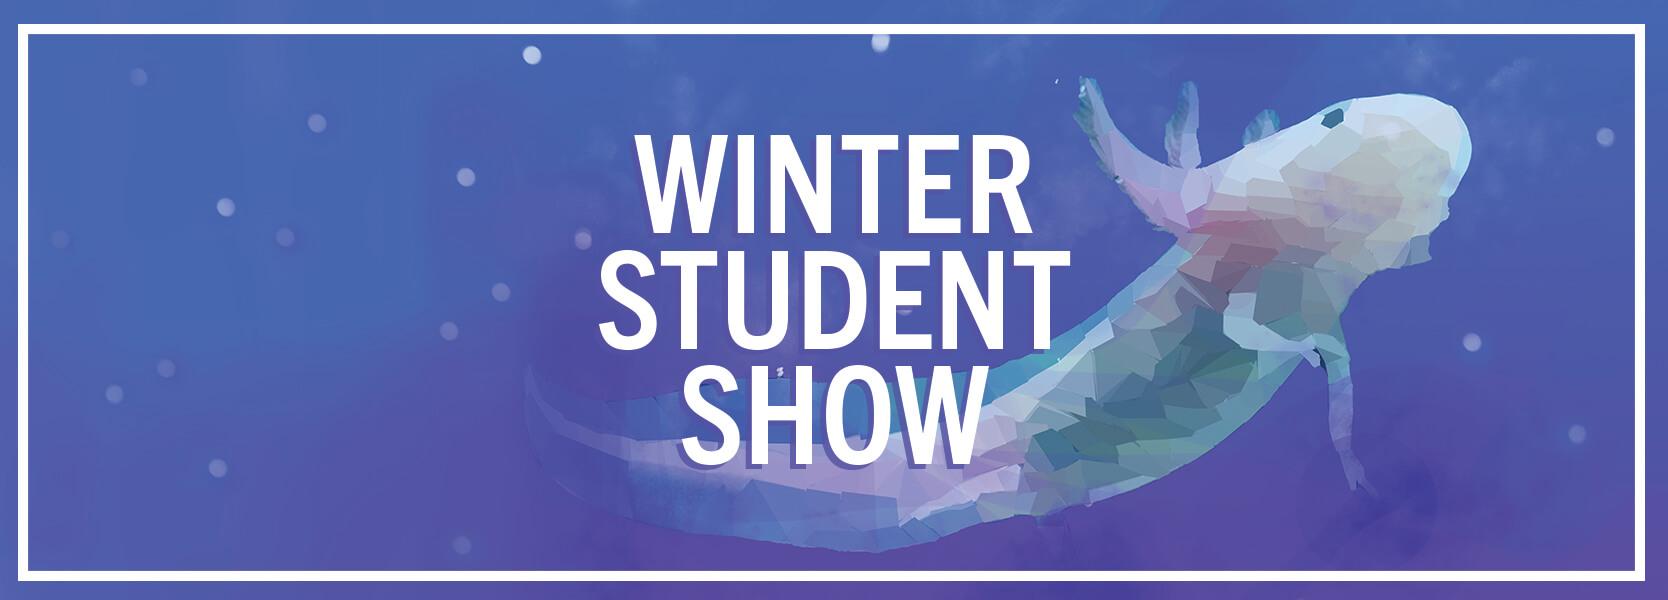 WinterShowbanner3